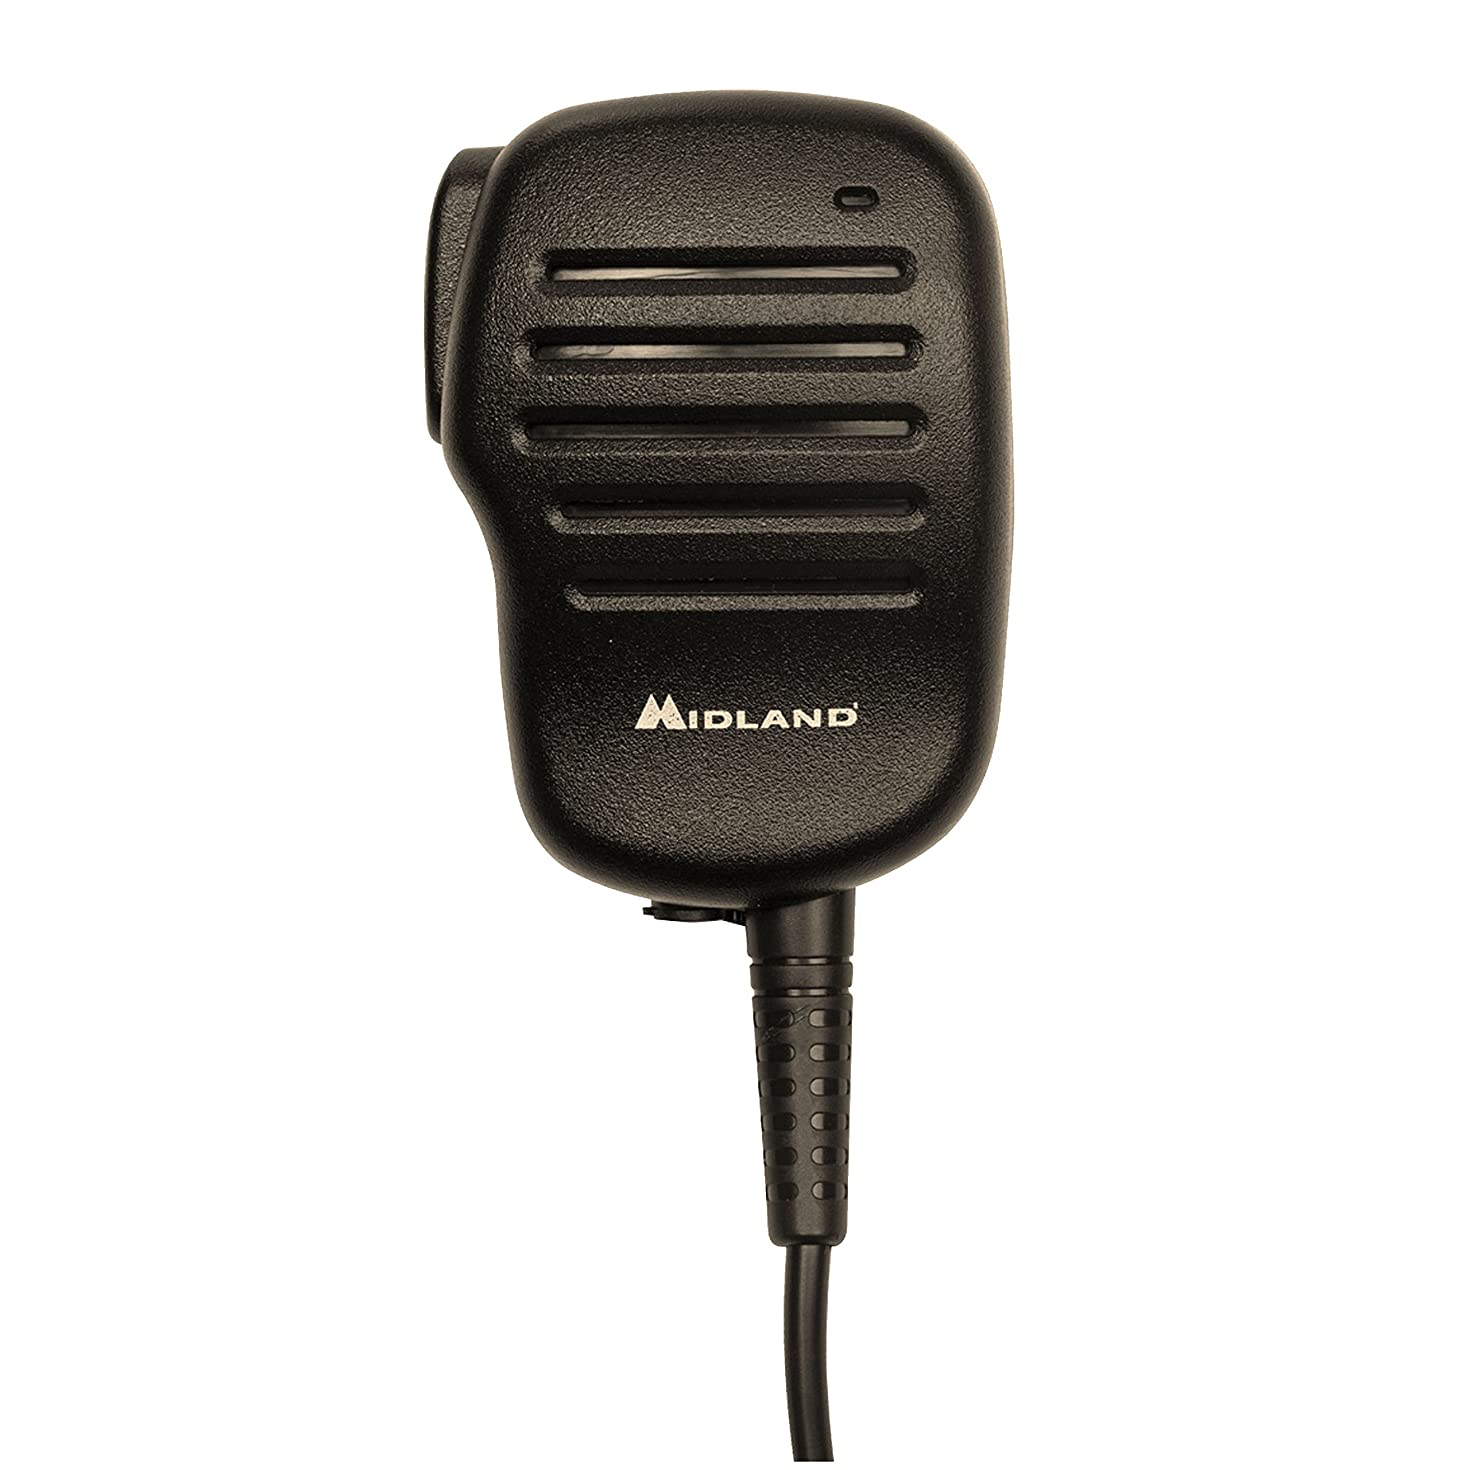 Midland Consumer Radio BA4 Shoulder Speaker Microphone for Business Portable Radio